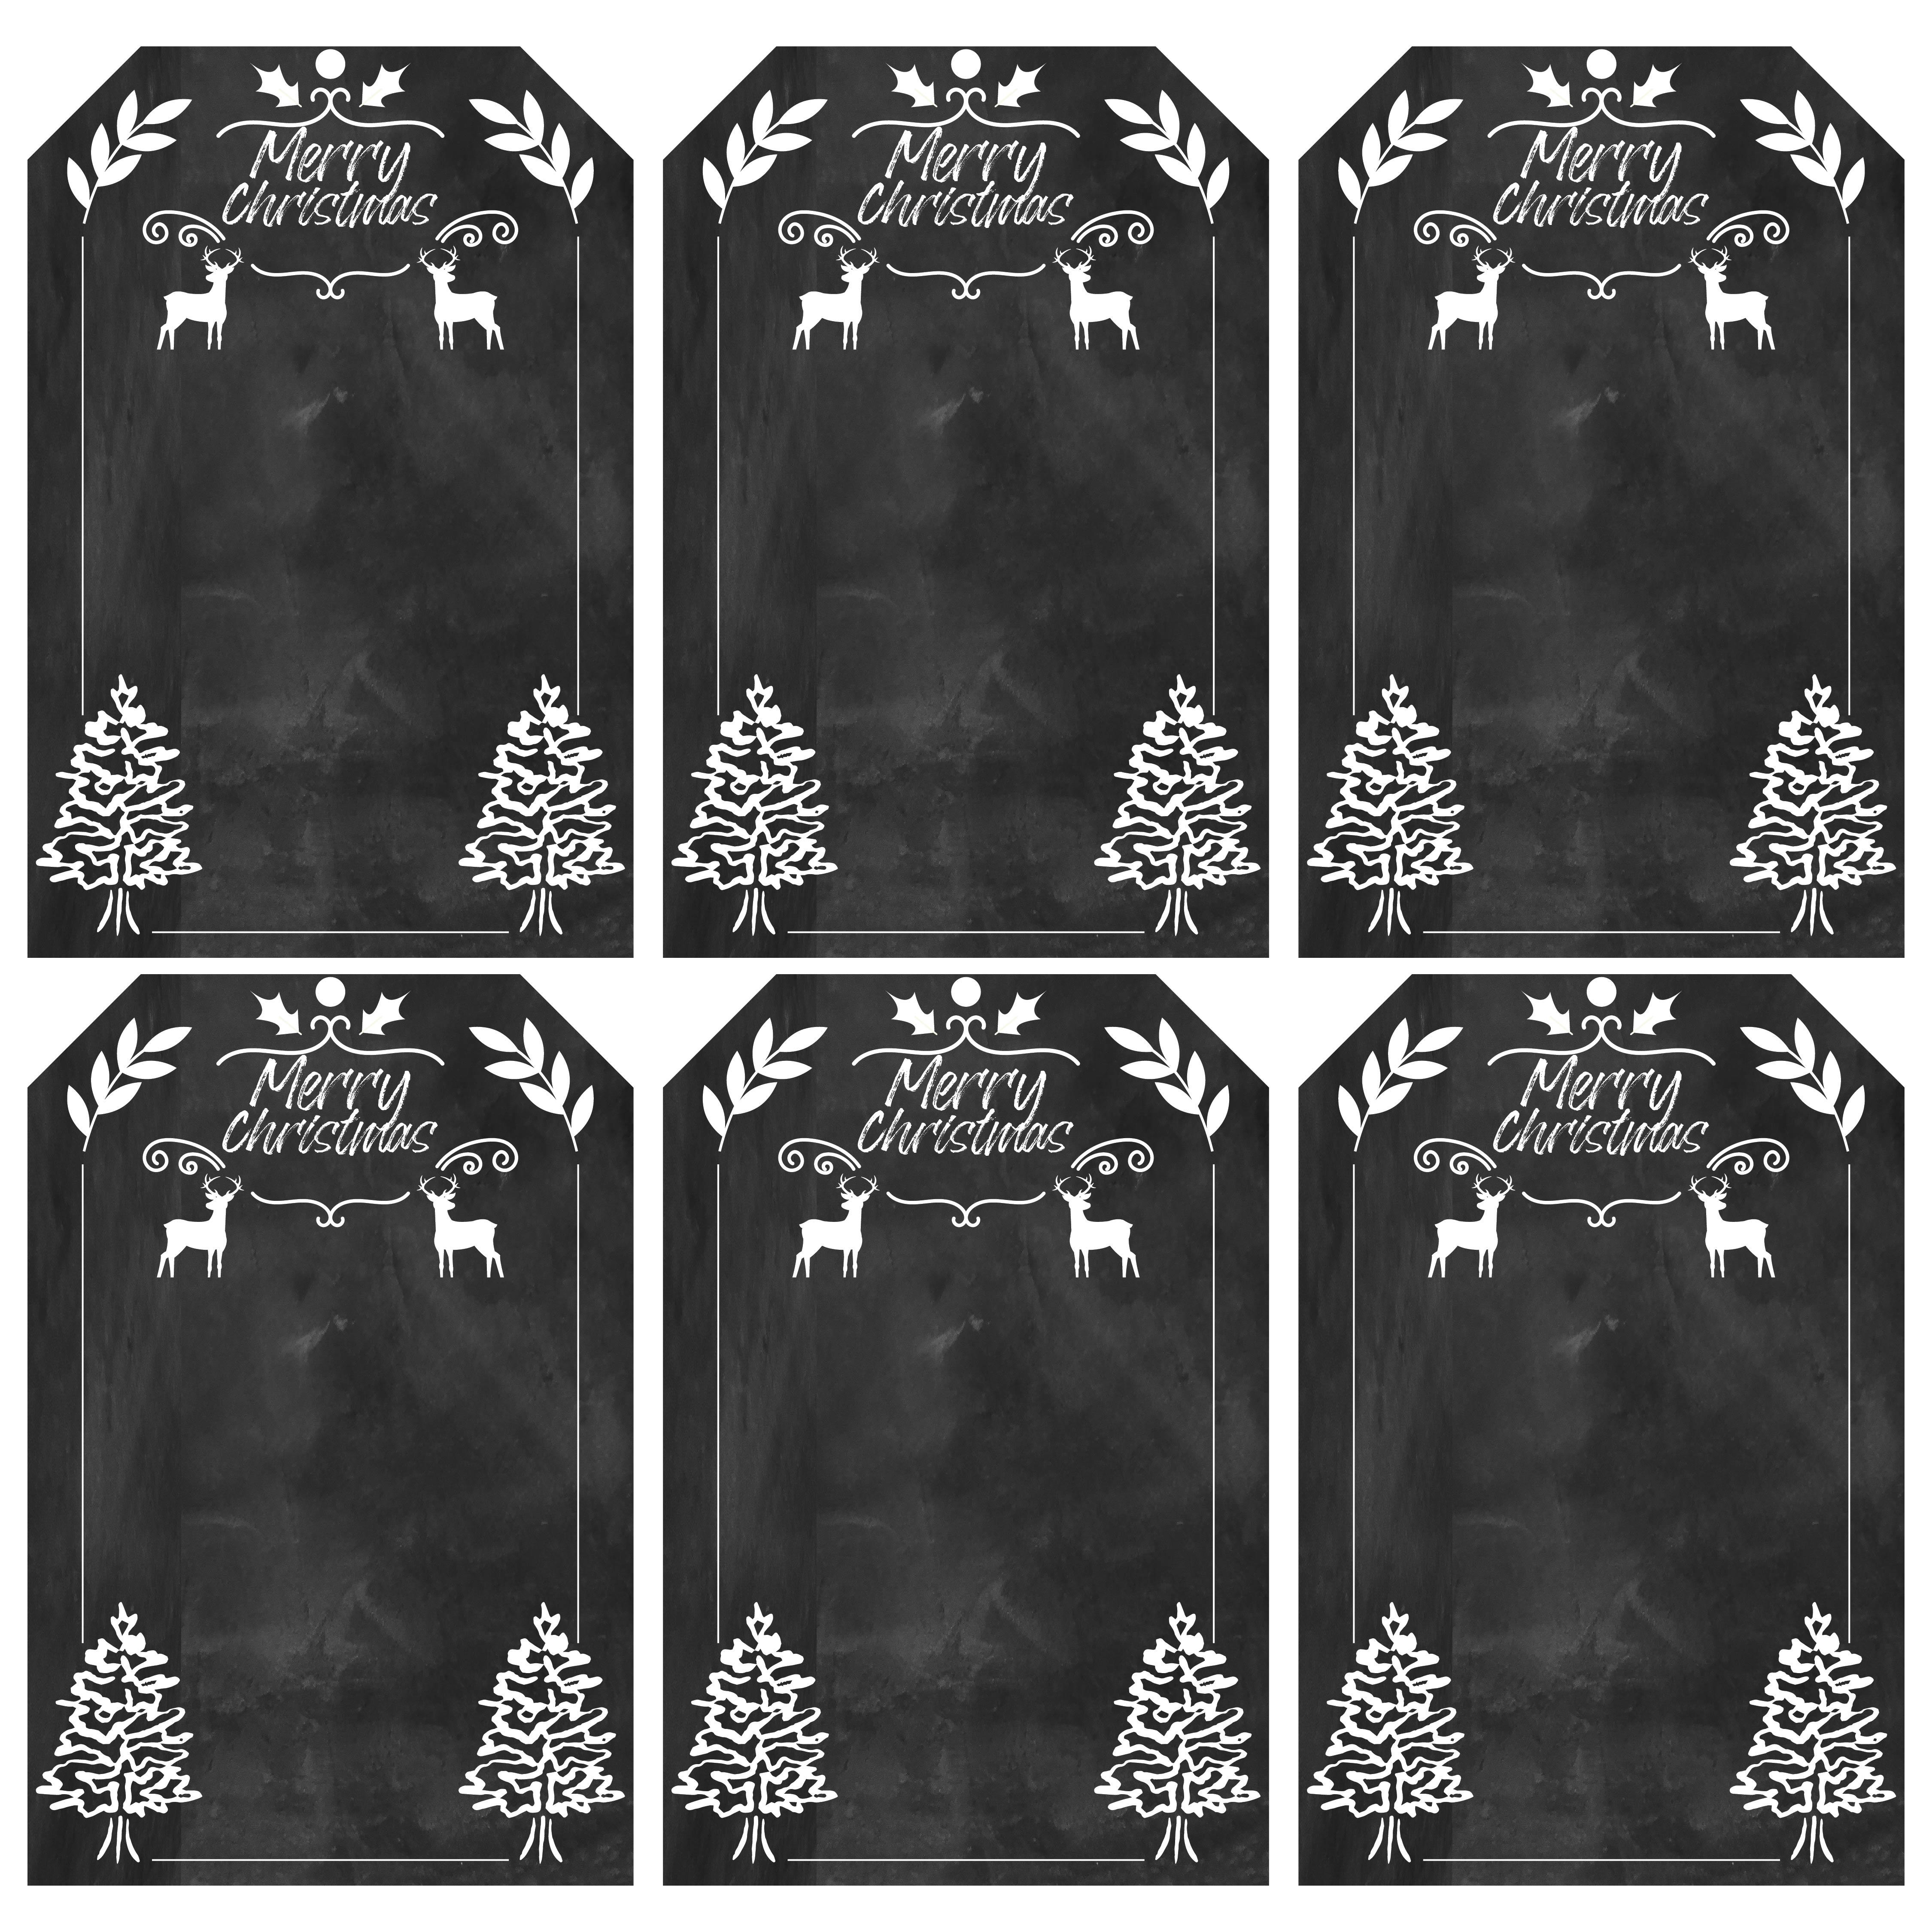 6 Images of Free Printable Christmas Gift Tags Chalkboard